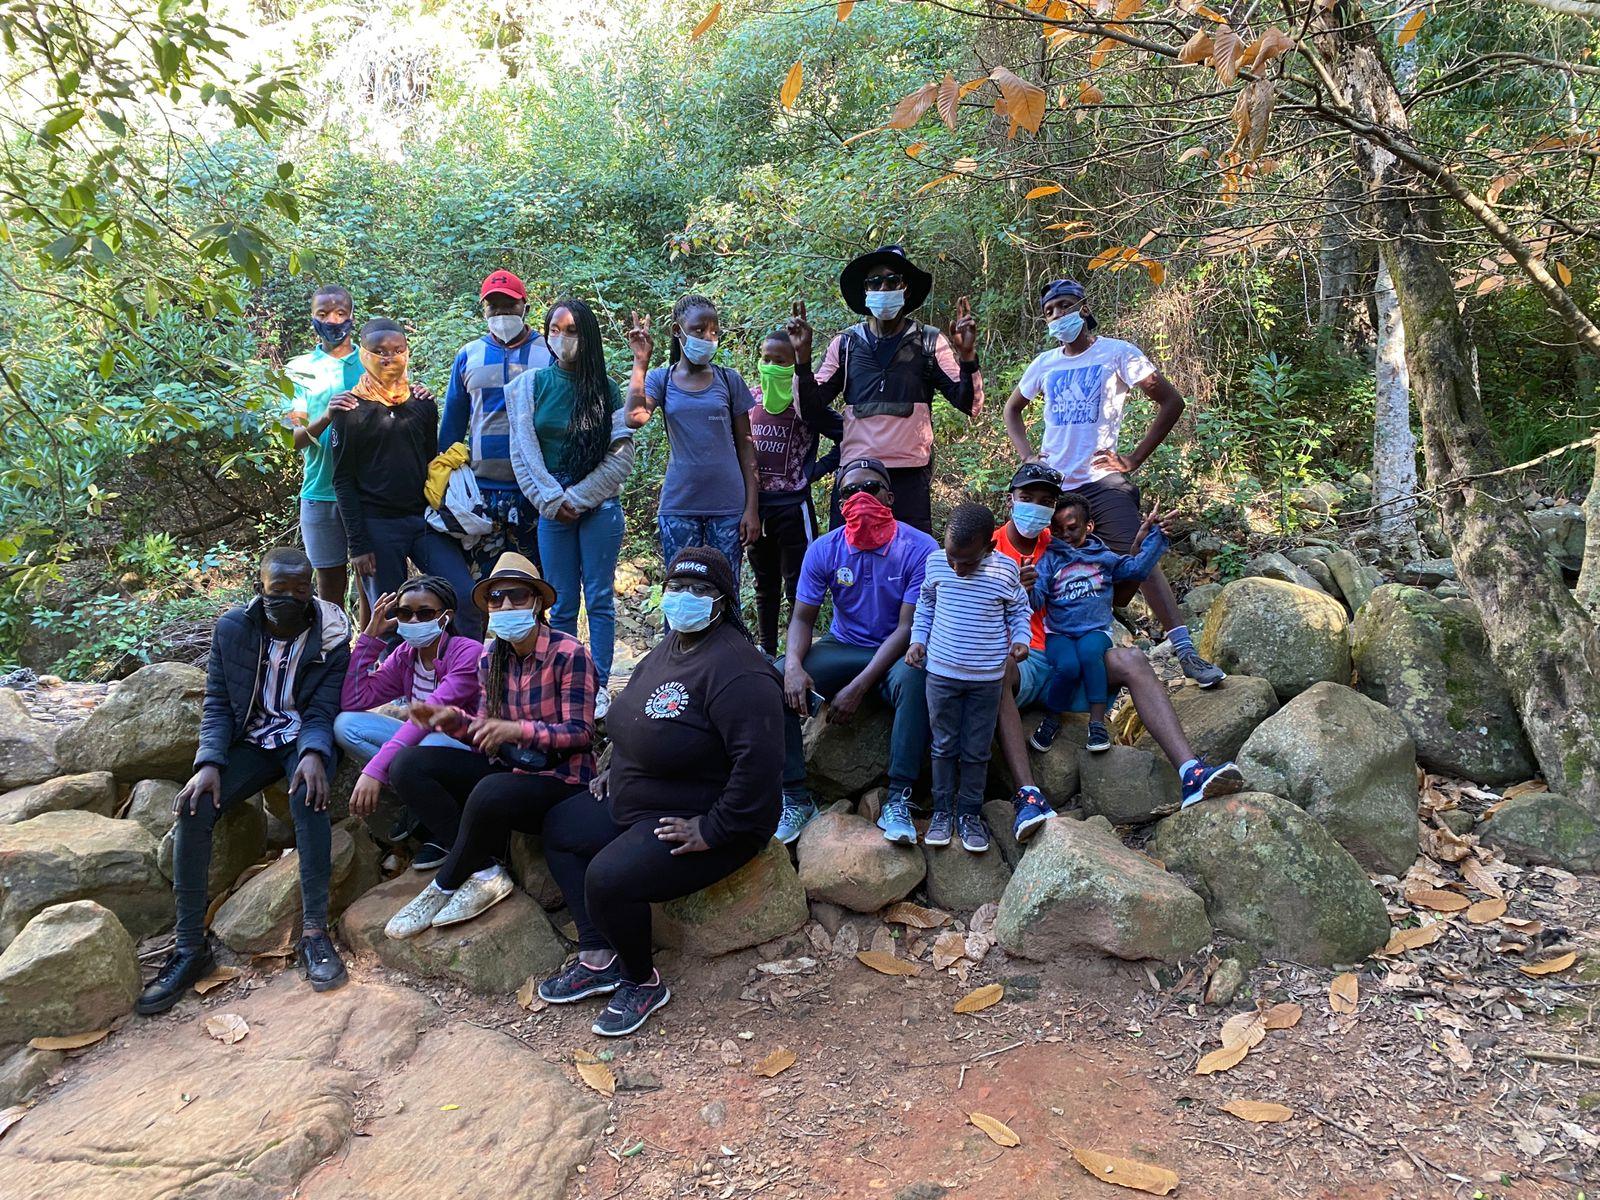 Newlands Forest Hike